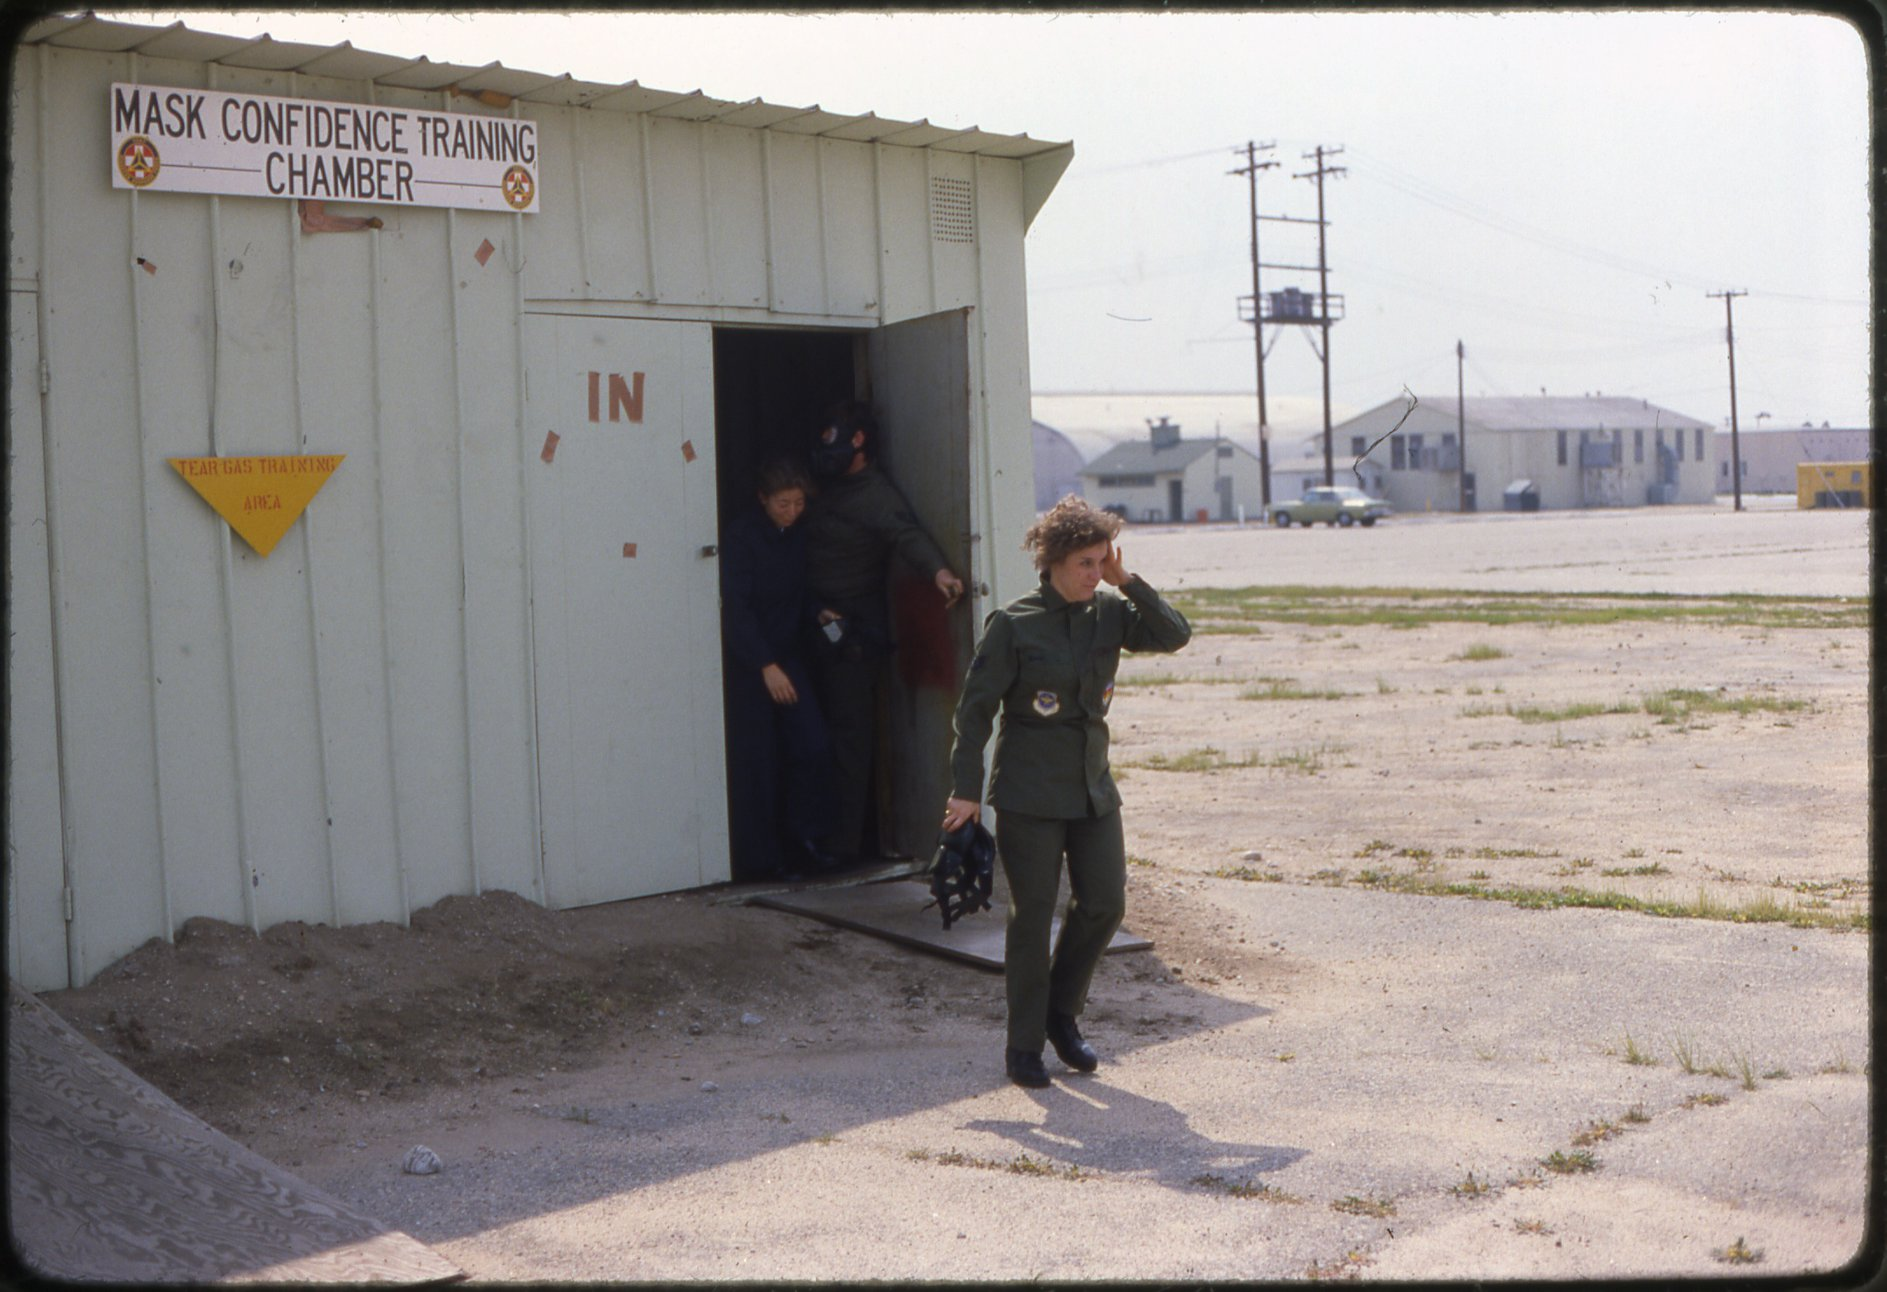 NortonAFB-17-Tear Gas Training